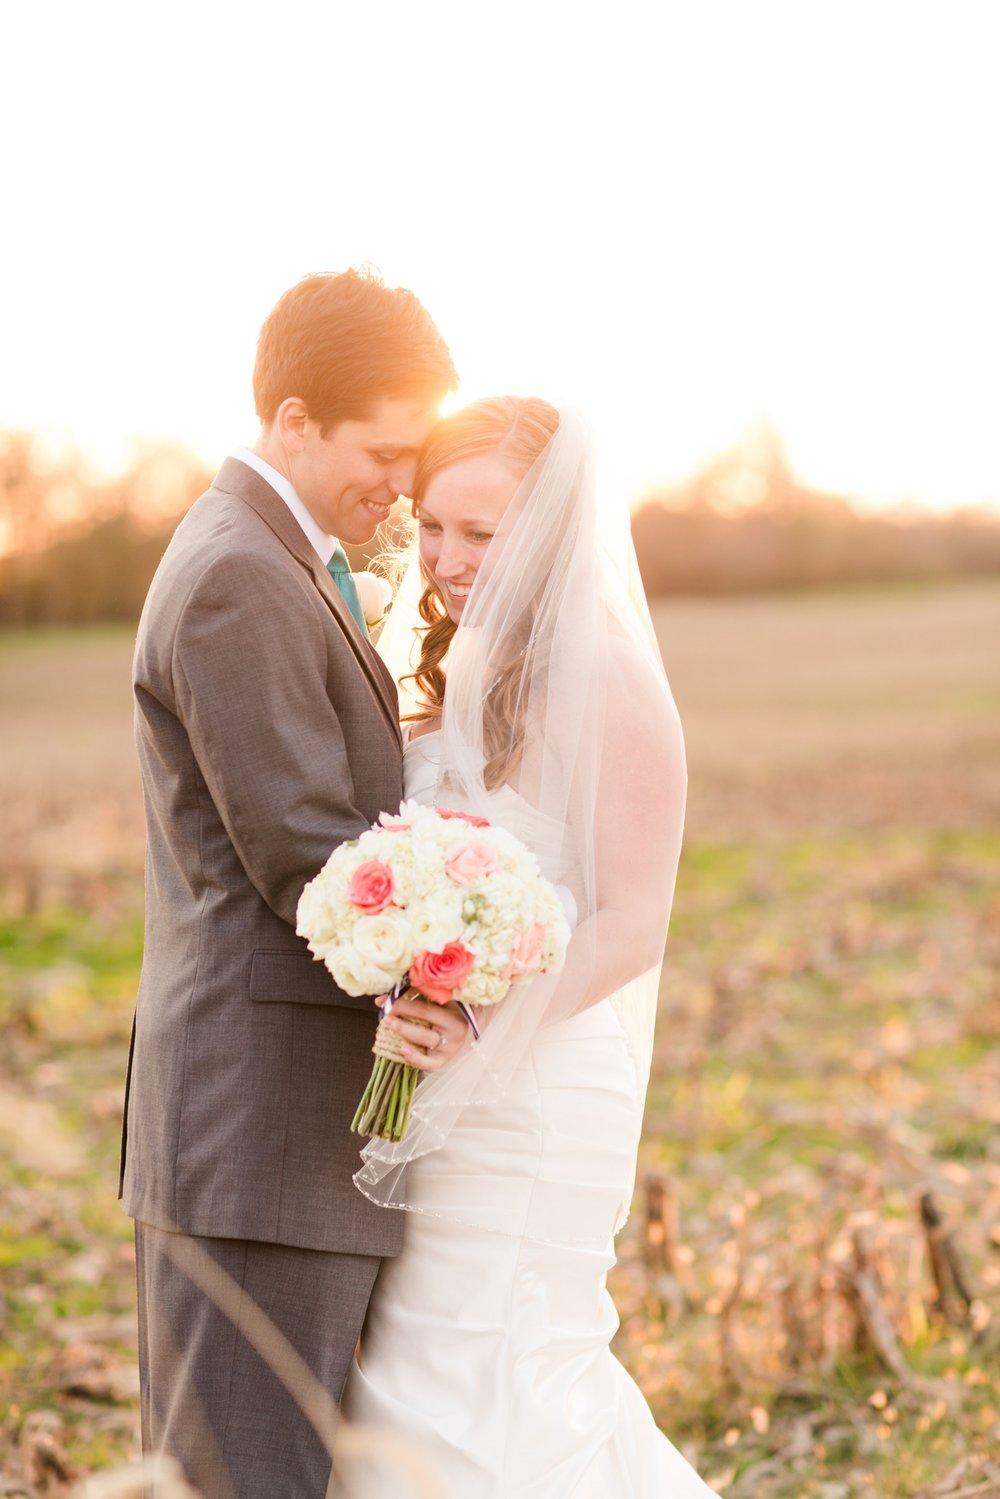 Bride and Groom-0332_maryland-wedding-photographer-anna-grace-photography-photo.jpg